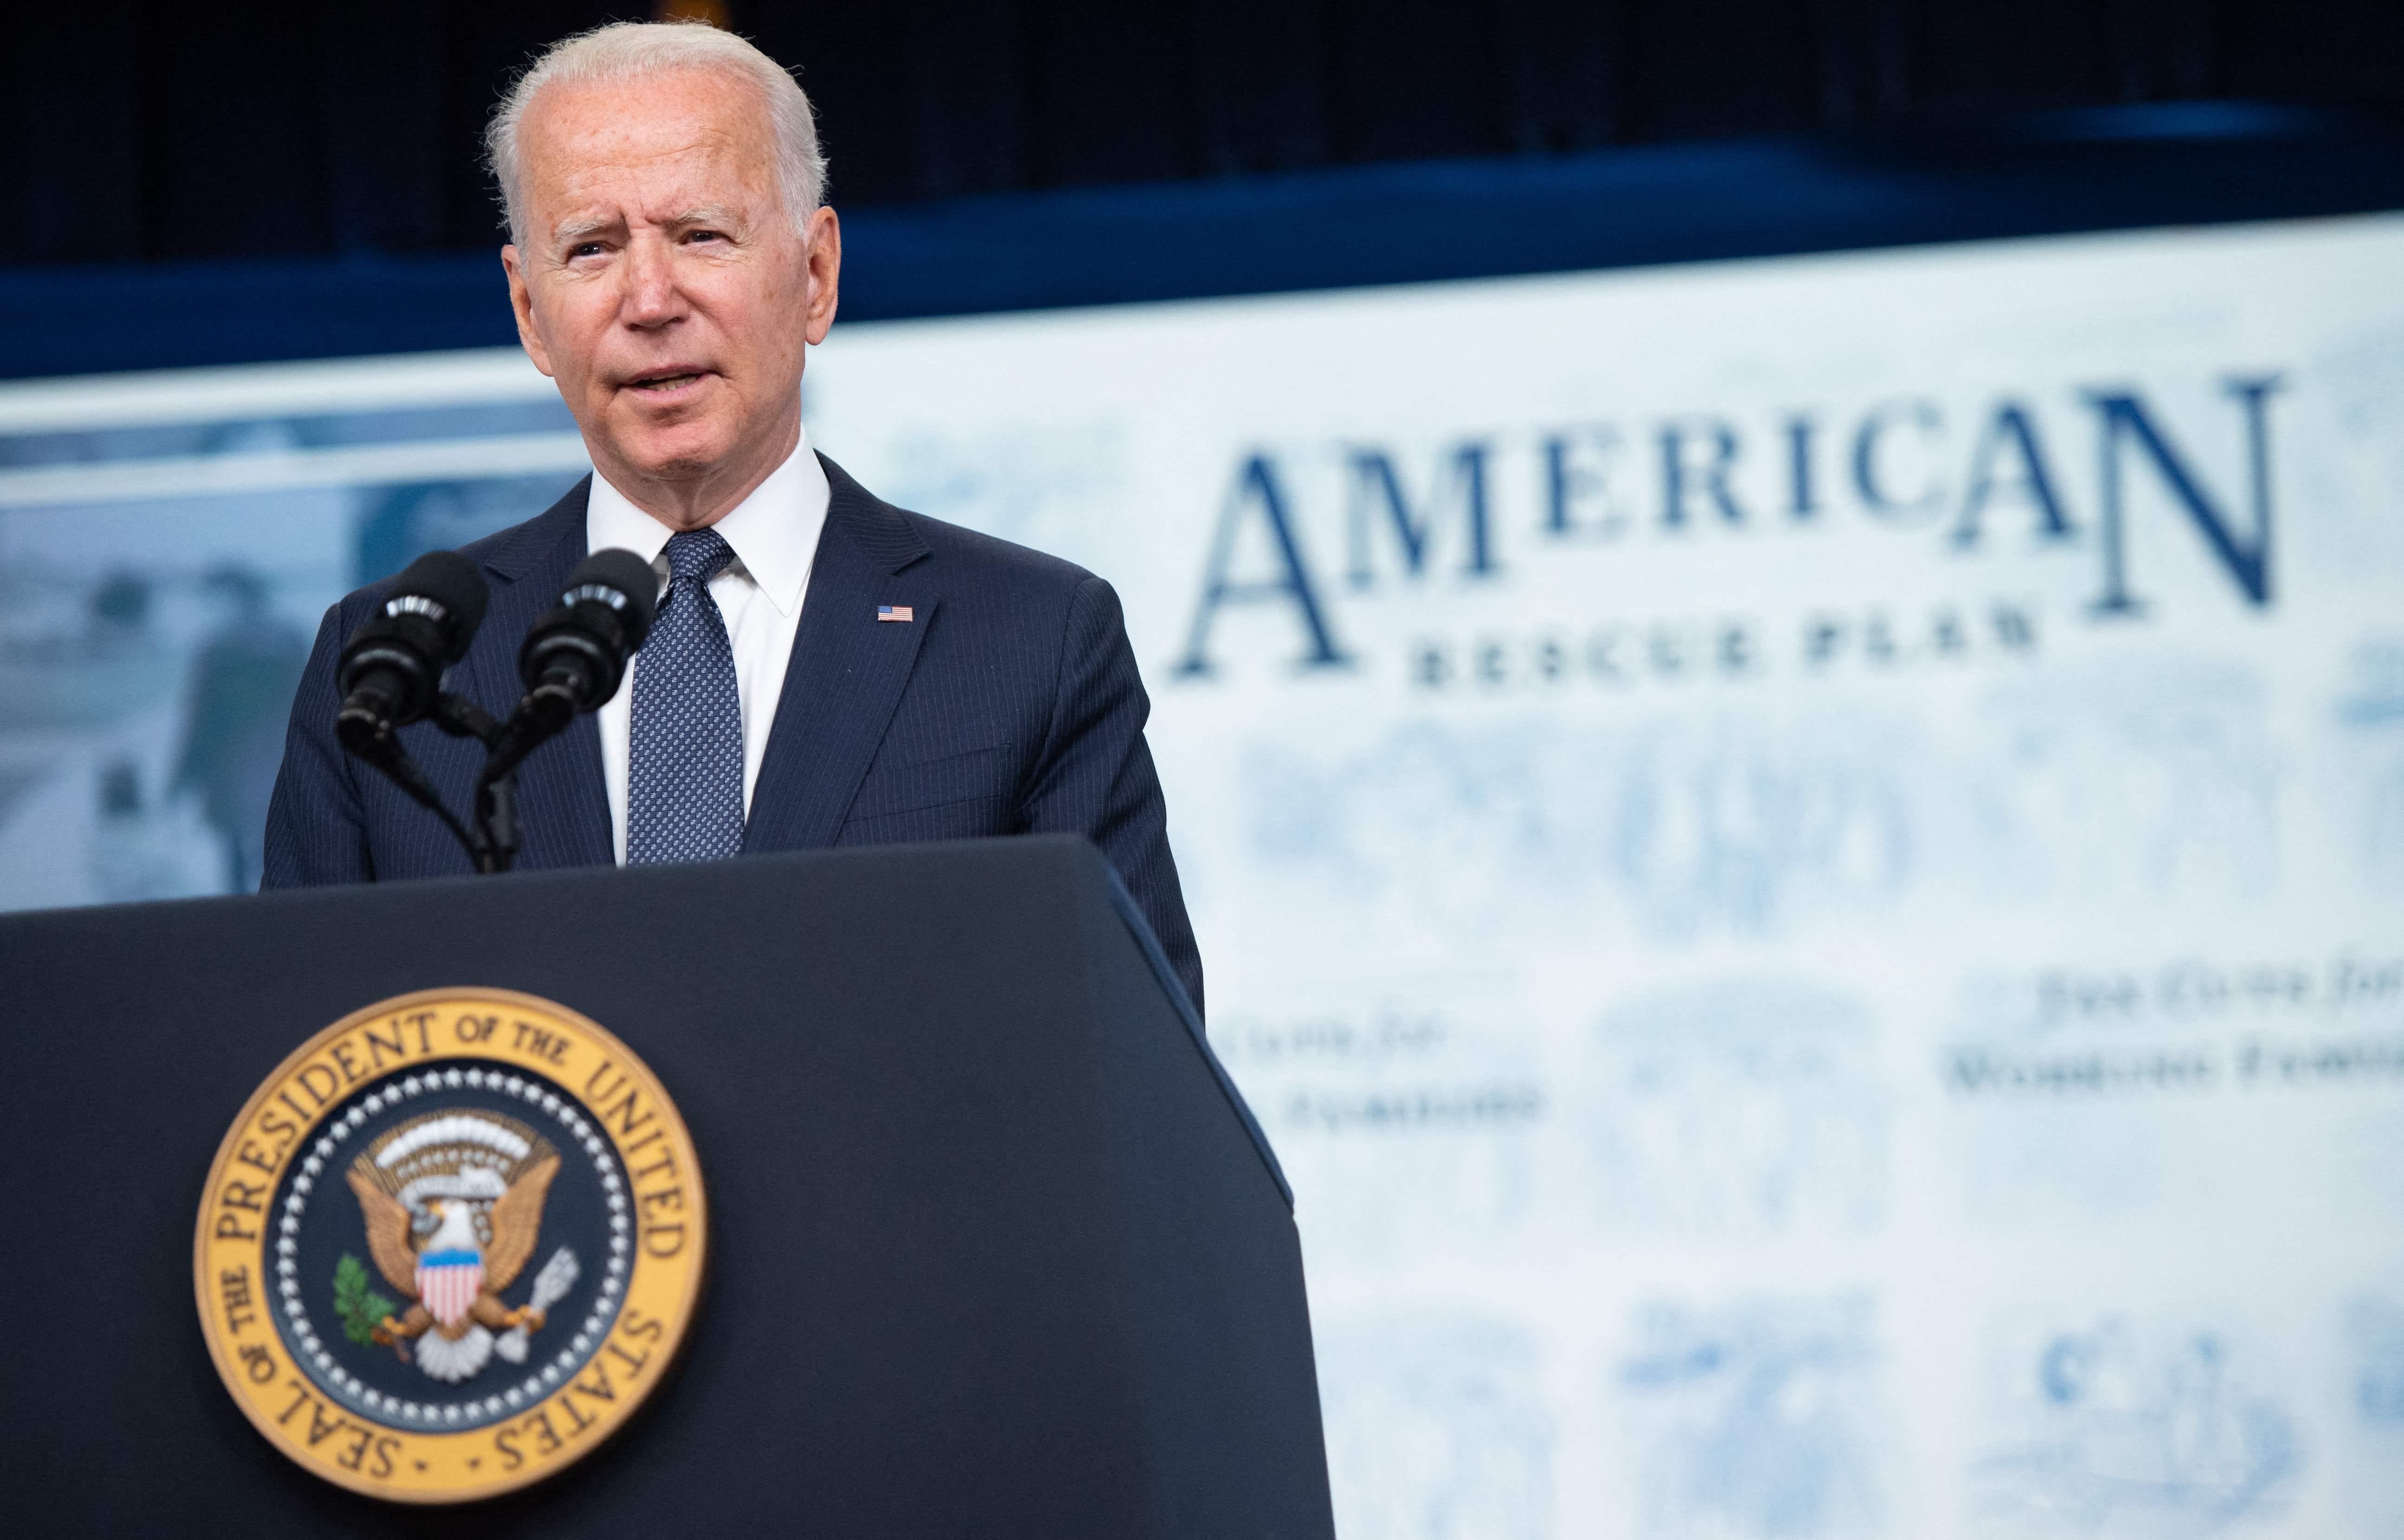 Shifting from campaign promises, Biden announces Cuba sanctions after protest crackdown